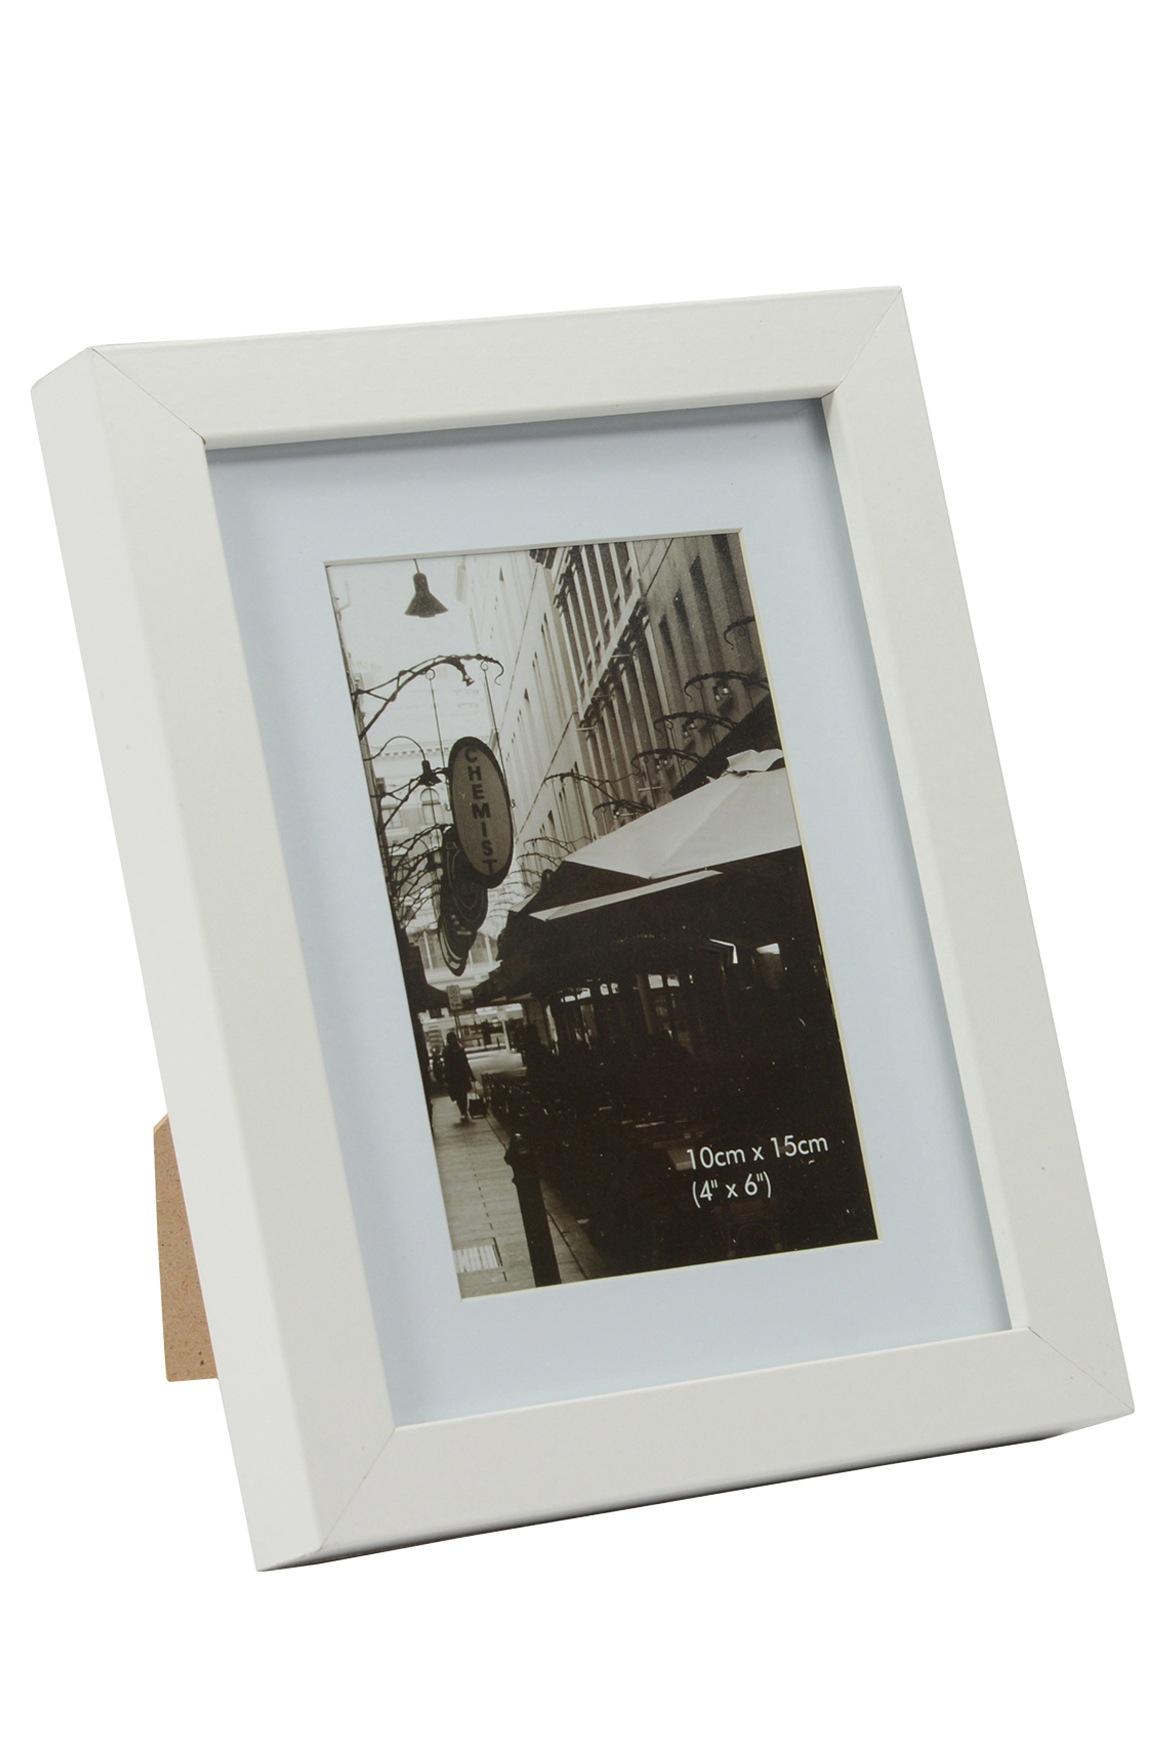 Vue | Essence Matt Board Photo Frame 20x30cm - White | Myer Online